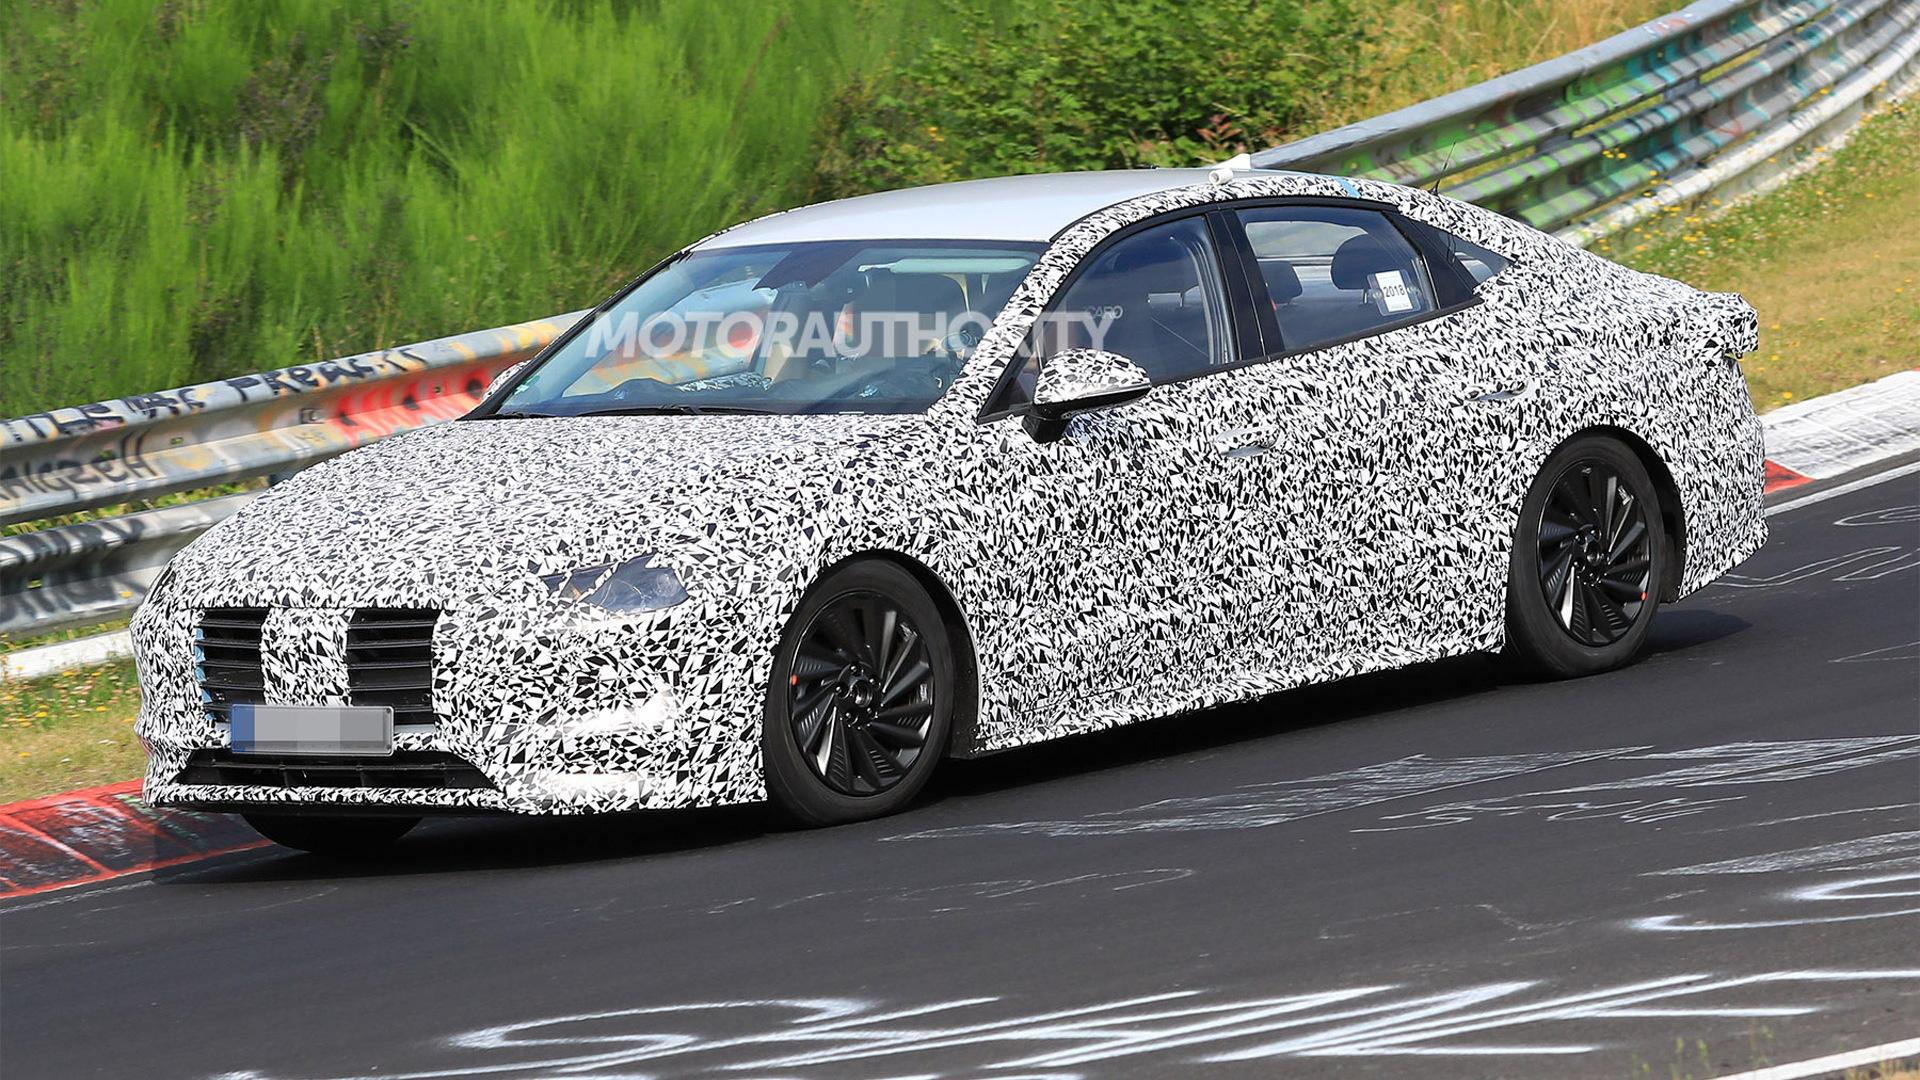 2020 Hyundai Sonata spy shots - Image via S. Baldauf/SB-Medien